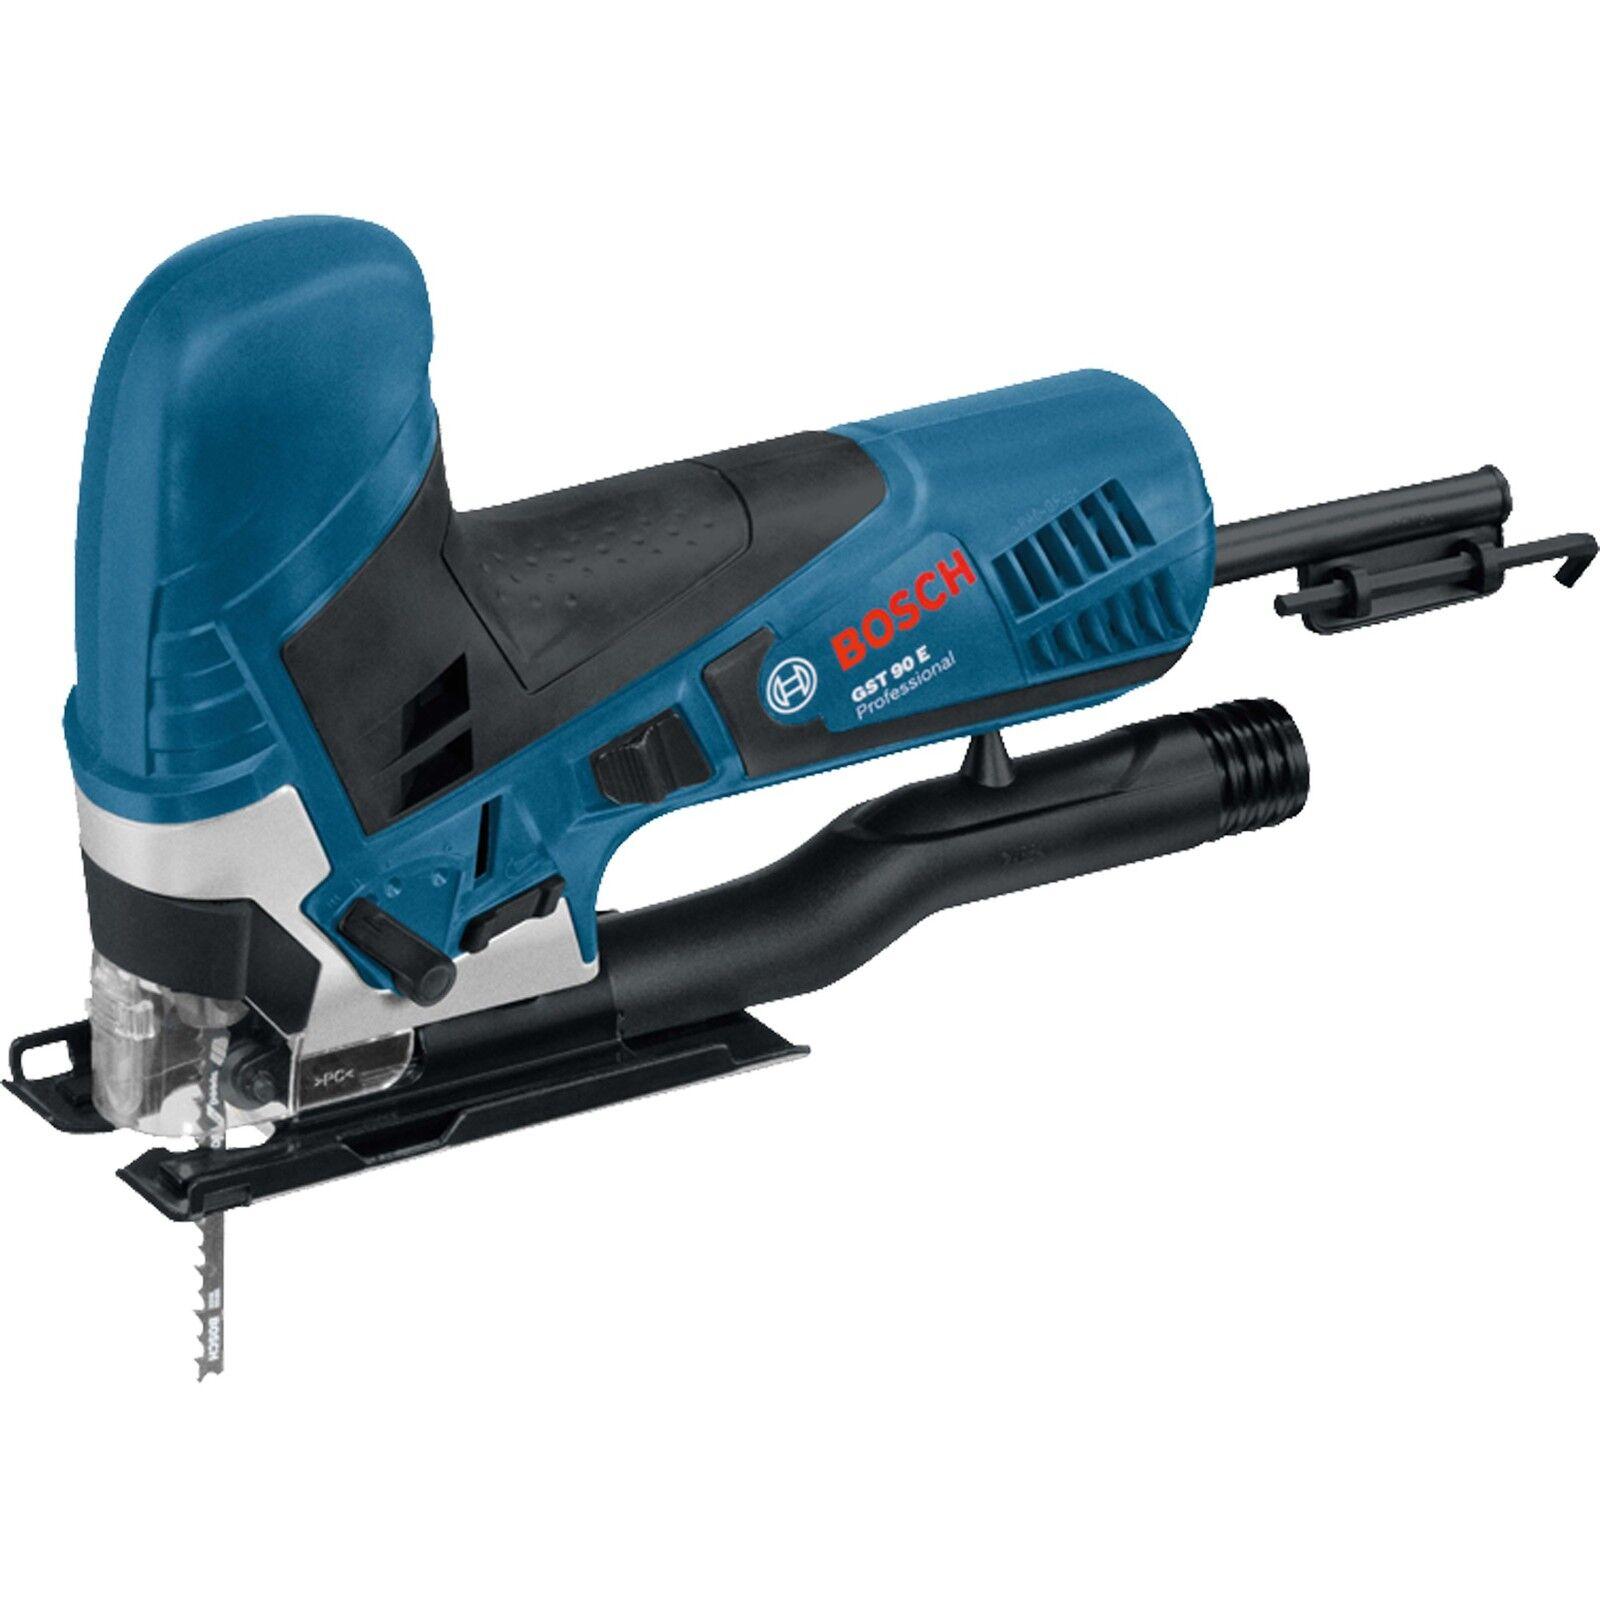 Bosch Professional Stichsäge GST 90 E Professional, blau